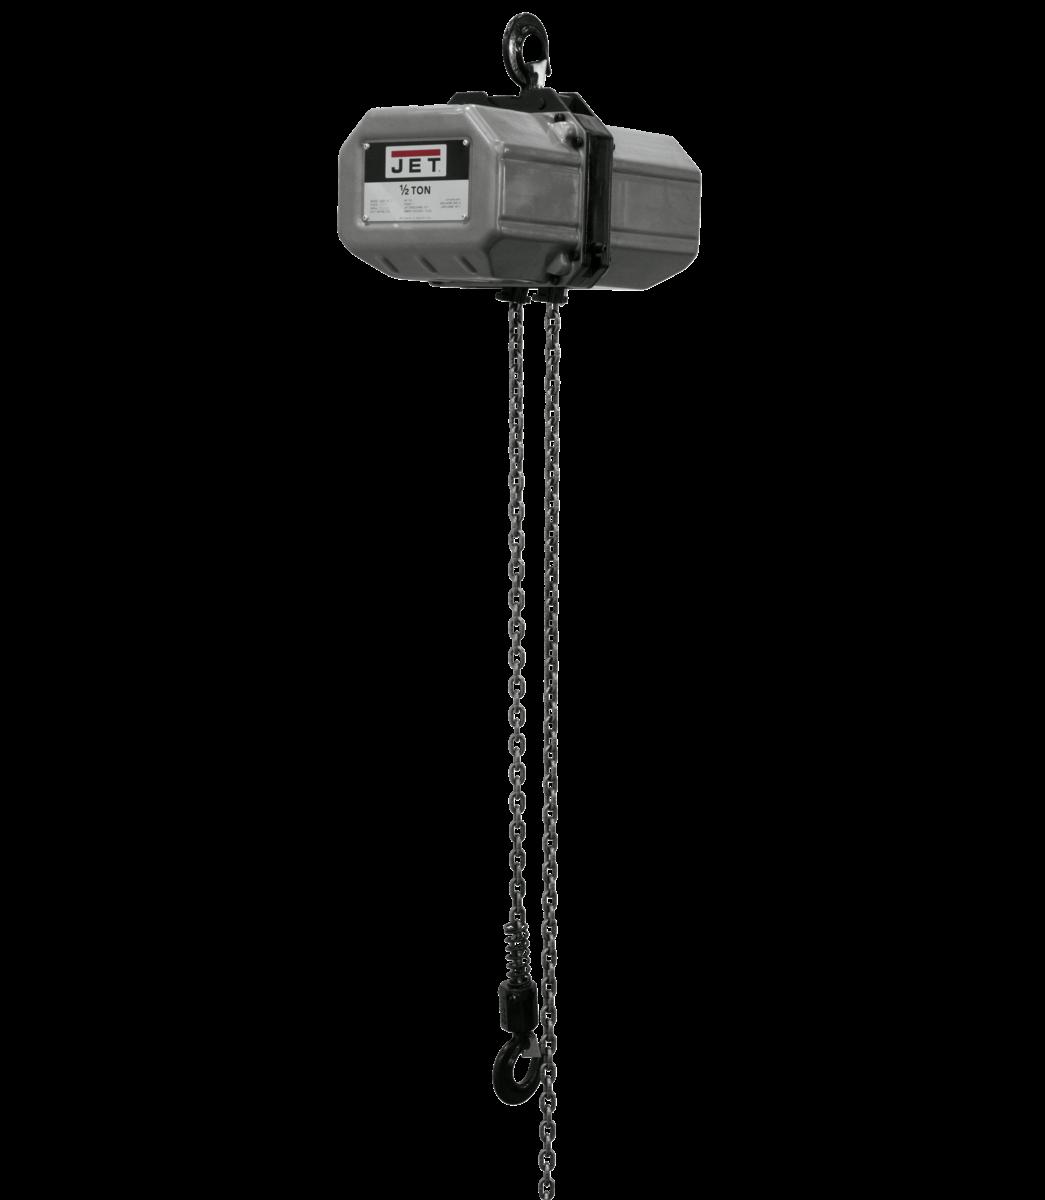 1/2SS-3C-15, 1/2-Ton Electric Chain Hoist 3-Phase 15' Lift